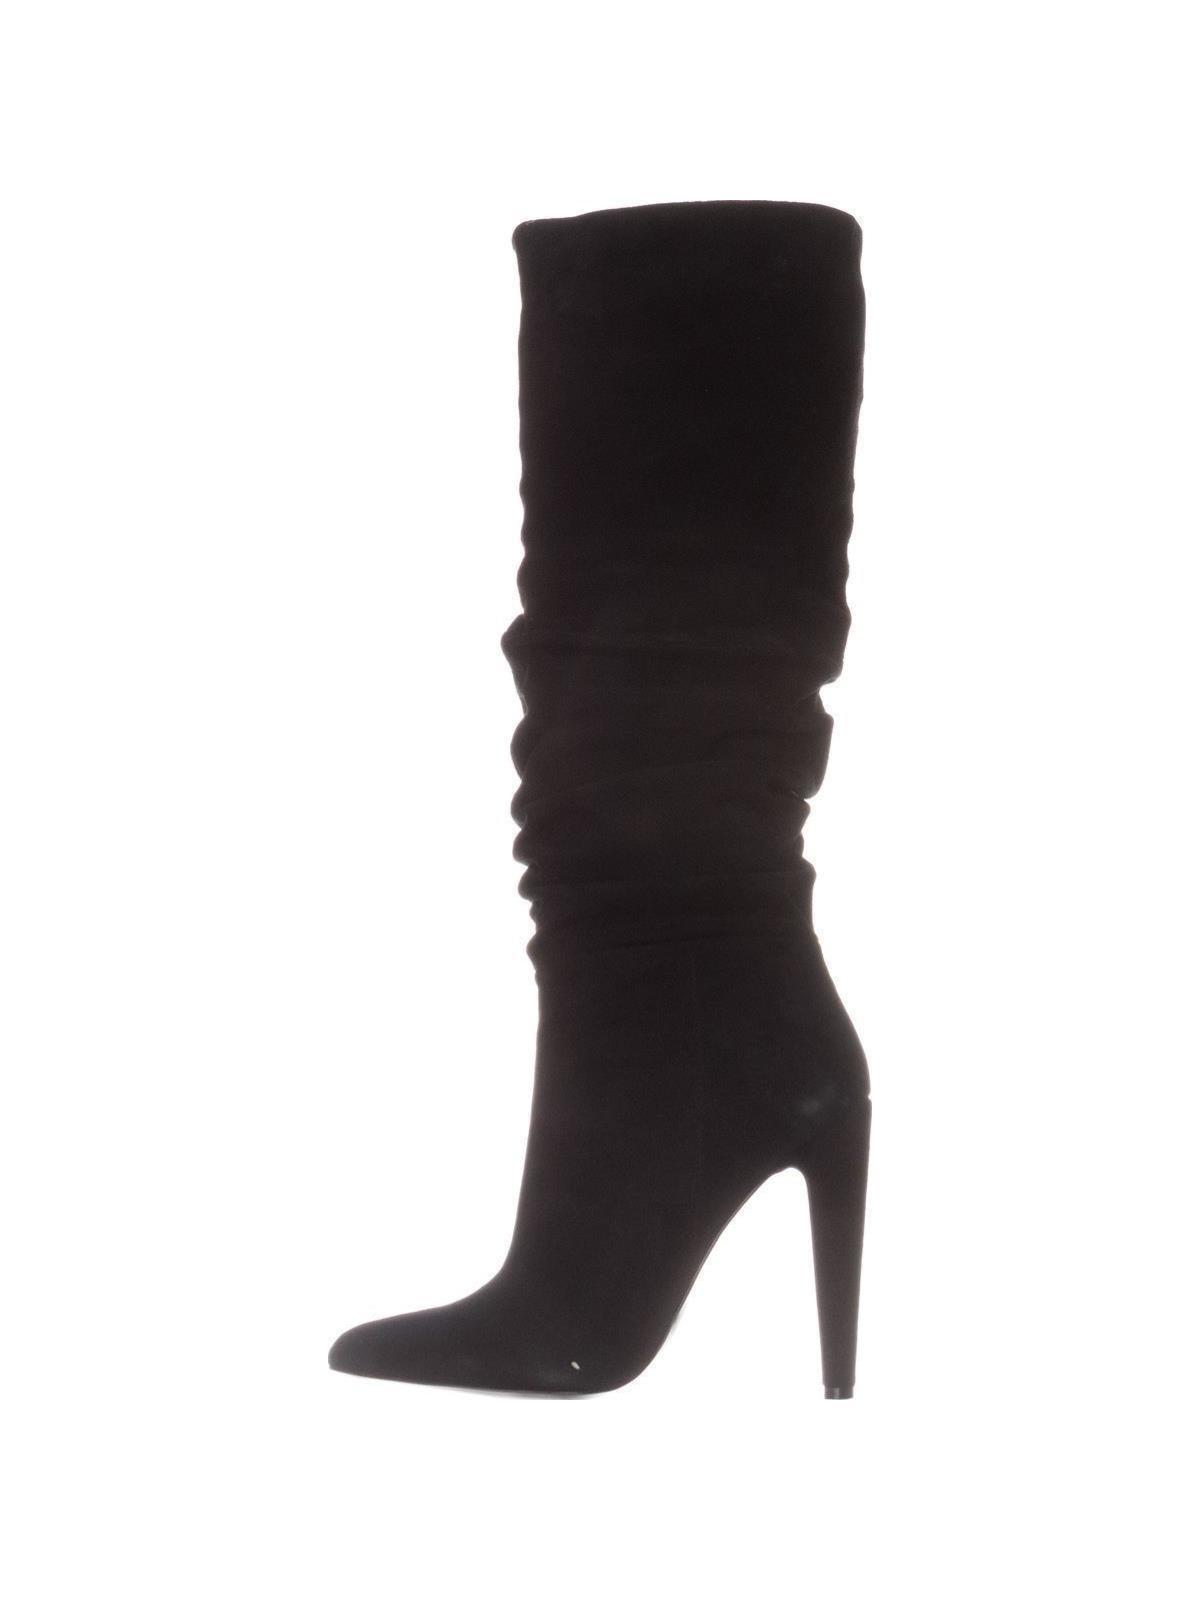 6262fae287c steve-madden - steve madden carrie high heel boot - black suede -  Walmart.com